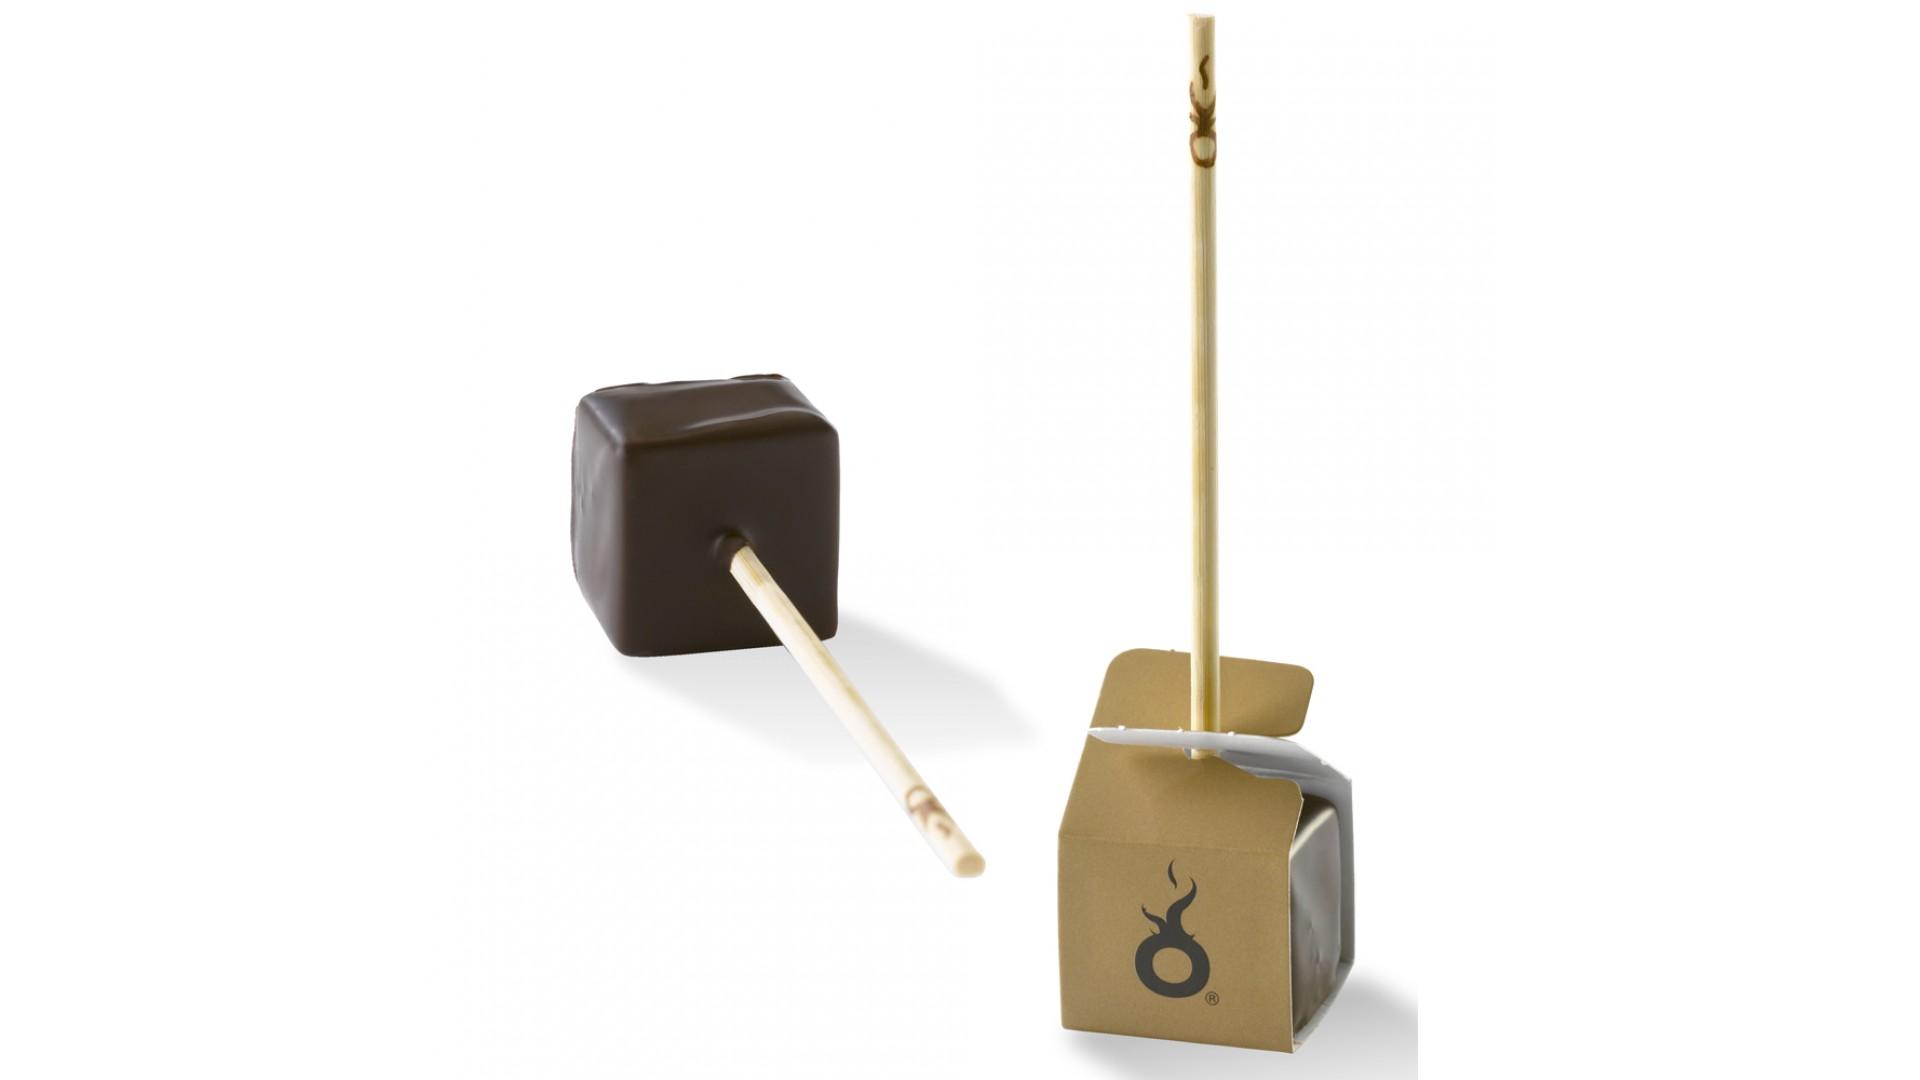 choc-o-lait stick